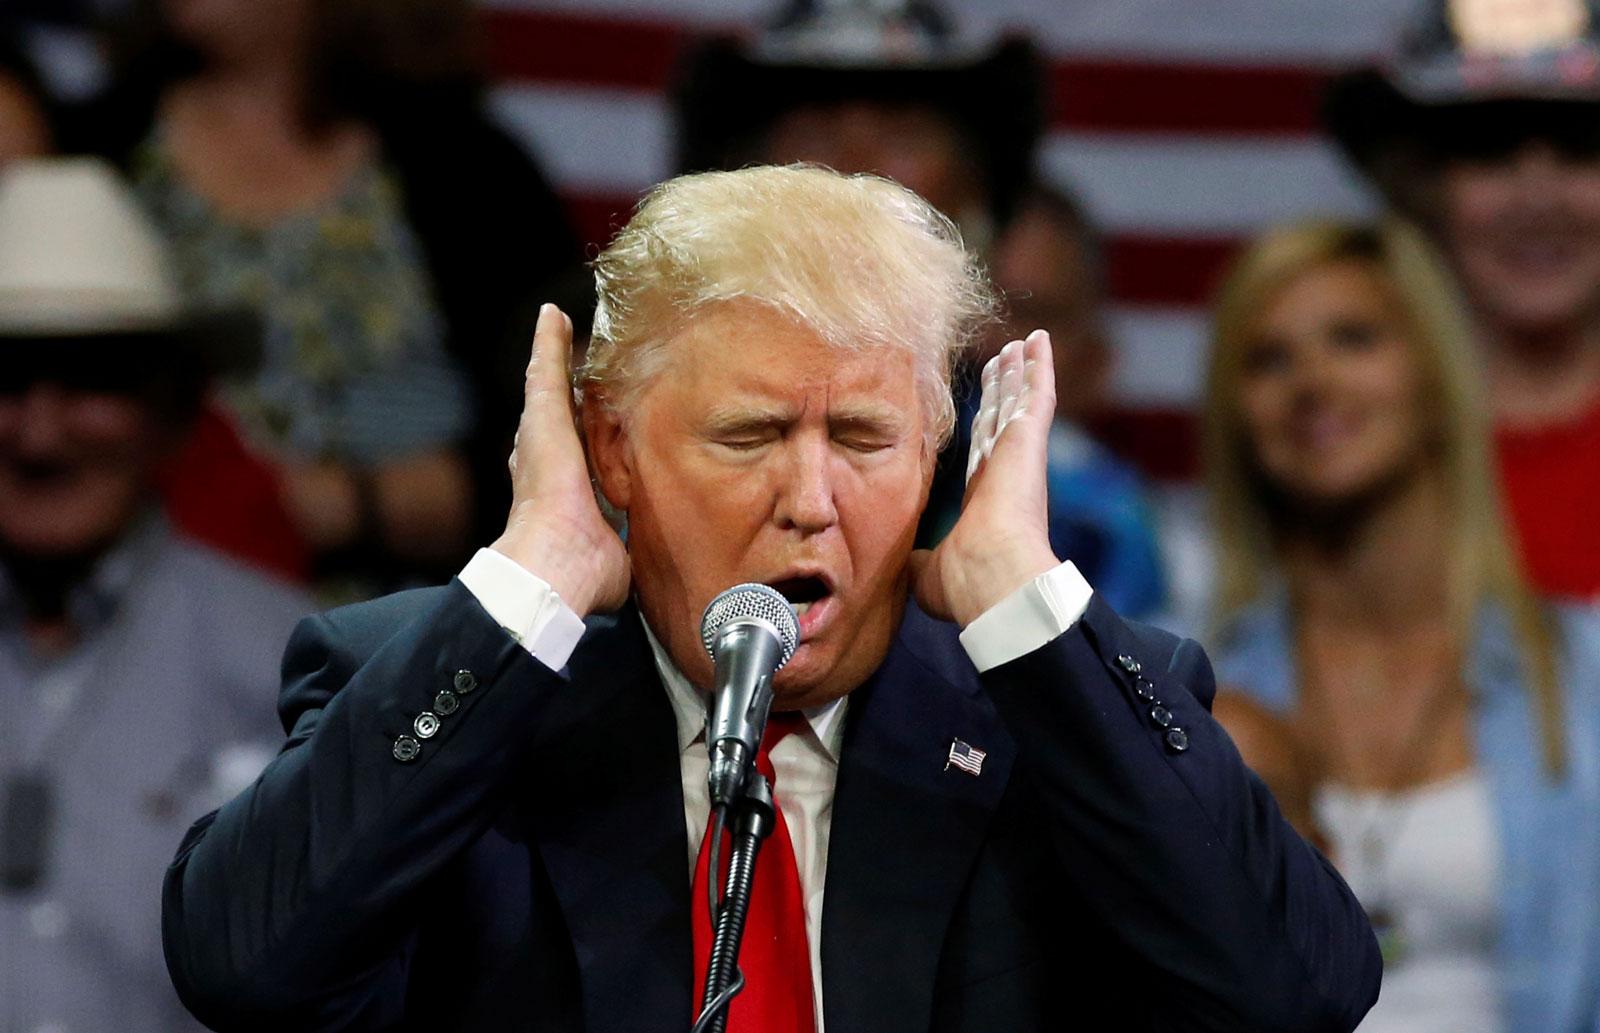 Donald Trump, Fresno, California, May 27, 2016